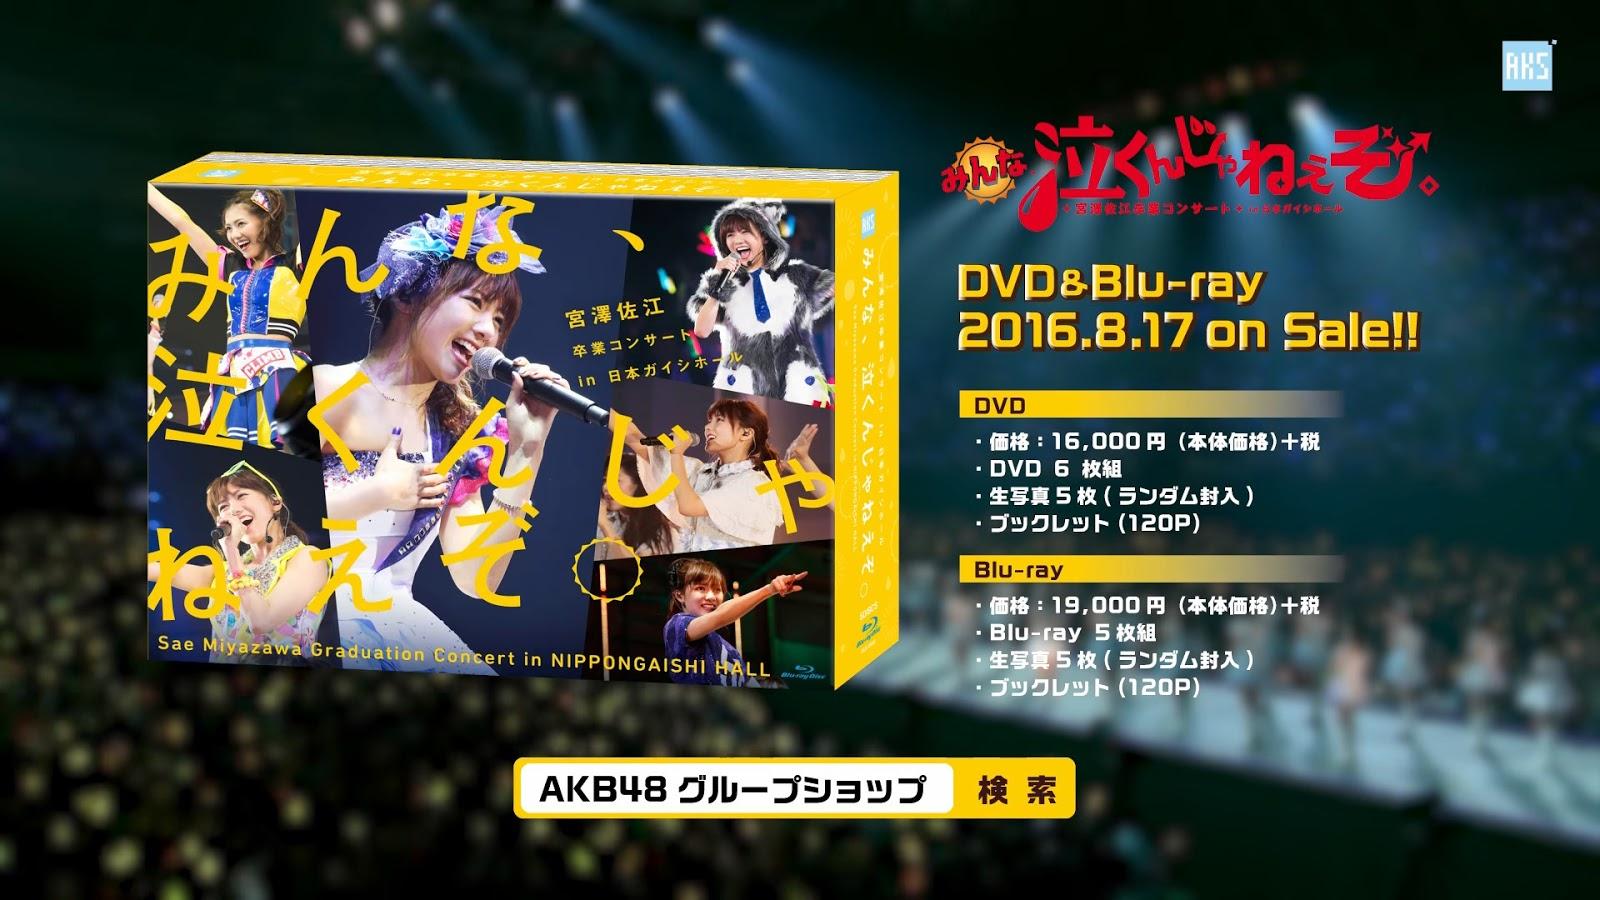 [BDRip] Minna, Nakunjanē zo. Miyazawa Sae Graduation Concert in Nippon Gaishi Hall (2016.08.17)